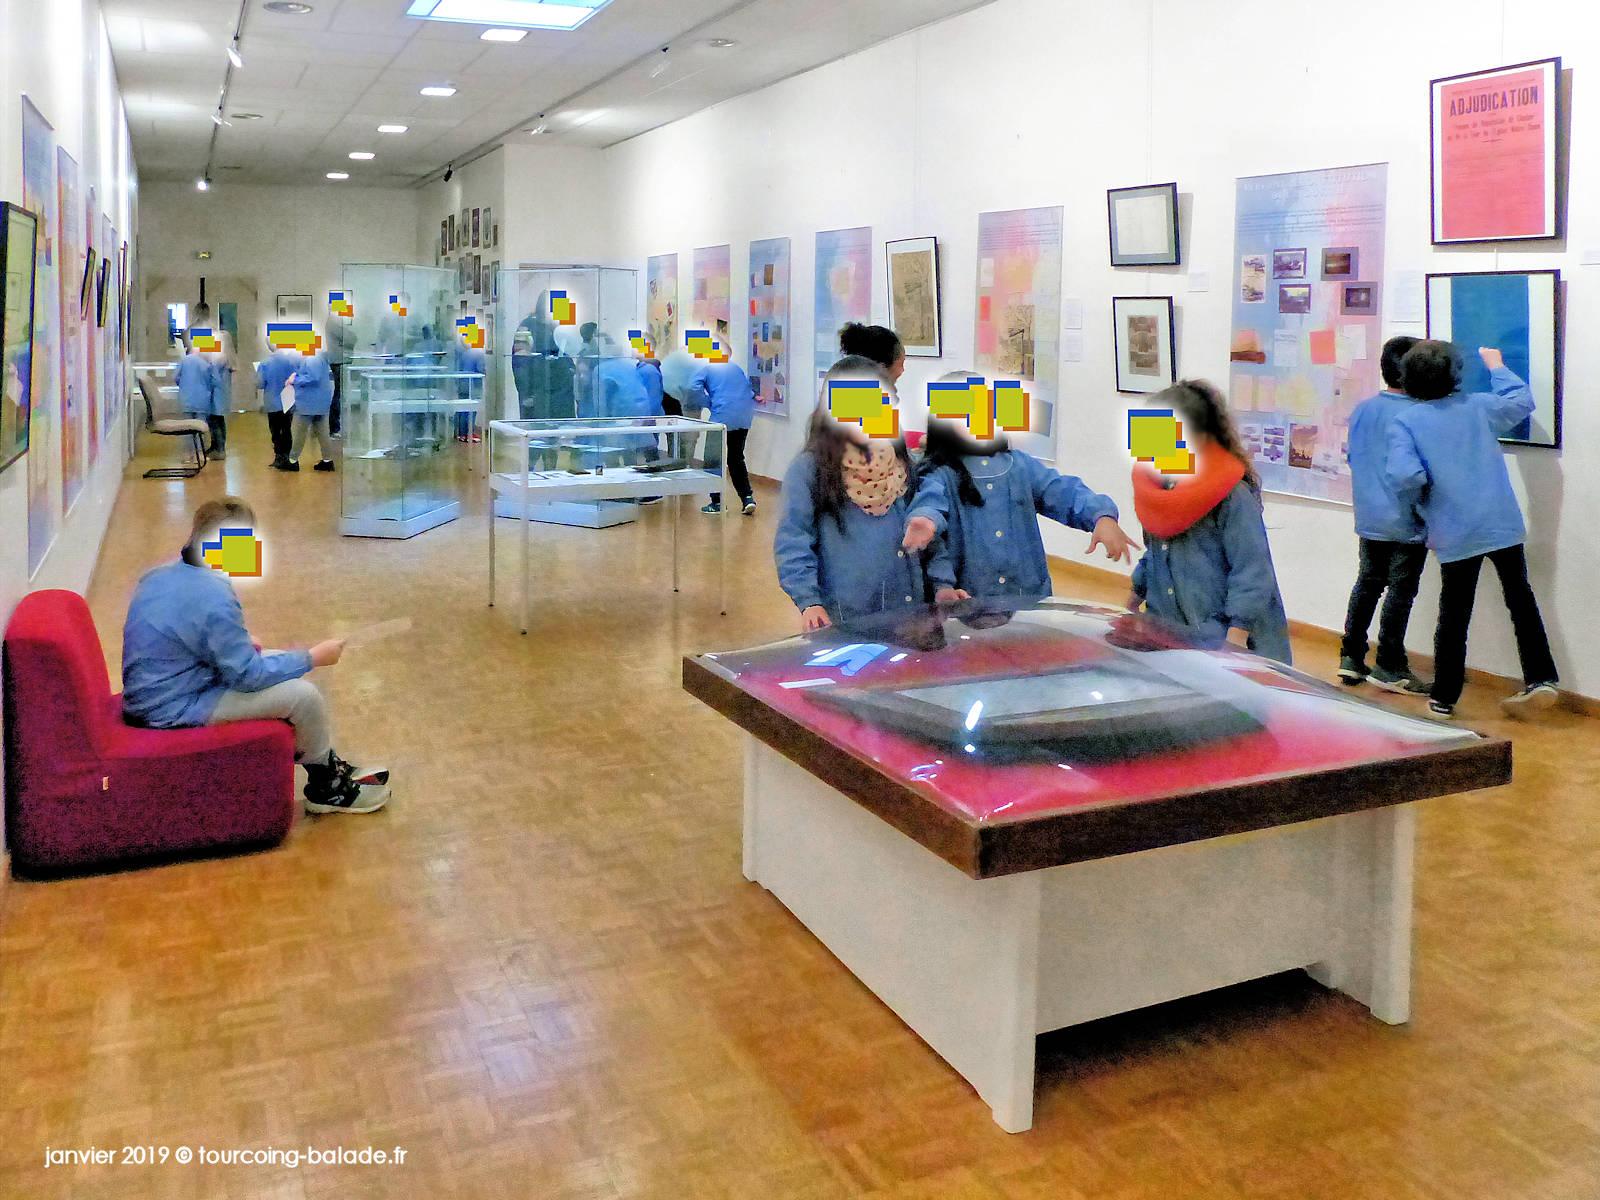 Archives municipales de Tourcoing - Expositions